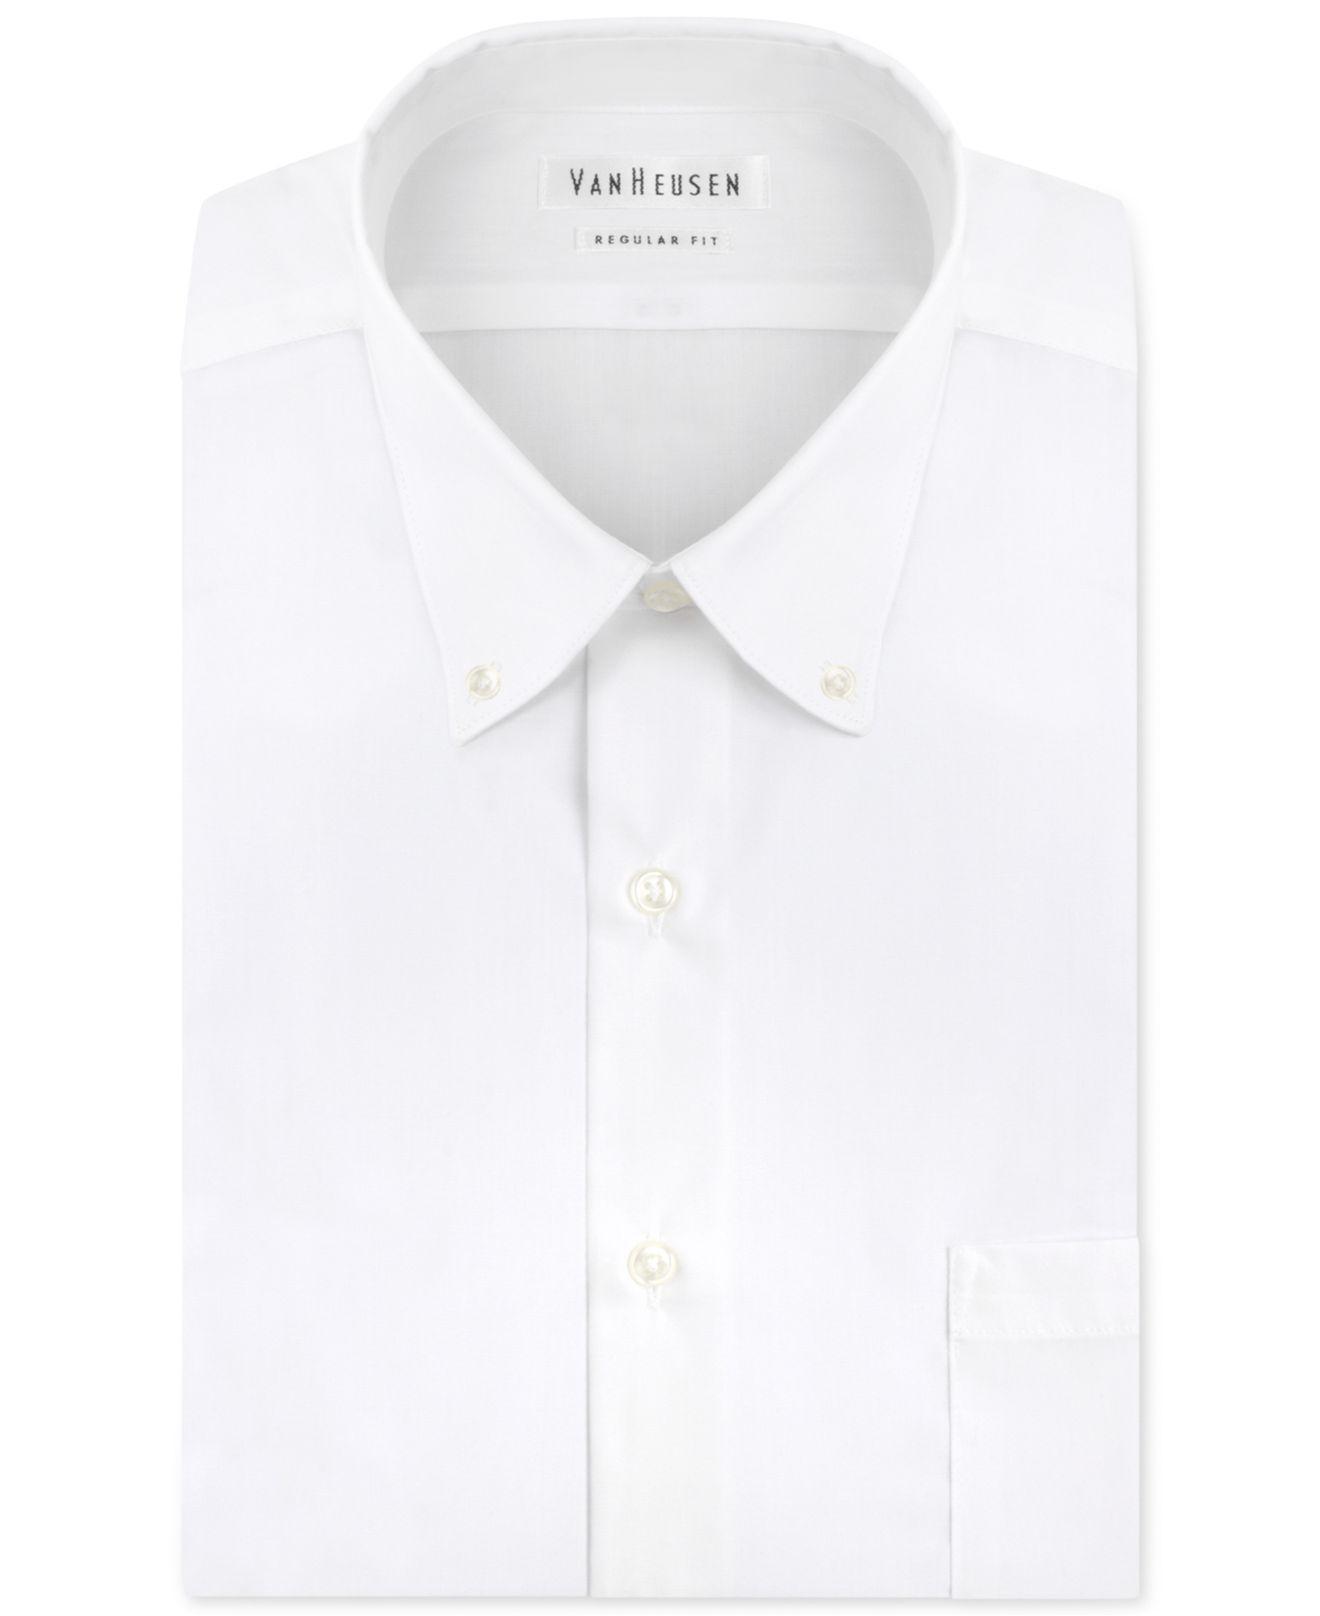 Van heusen men 39 s classic fit non iron poplin dress shirt for Van heusen non iron shirts